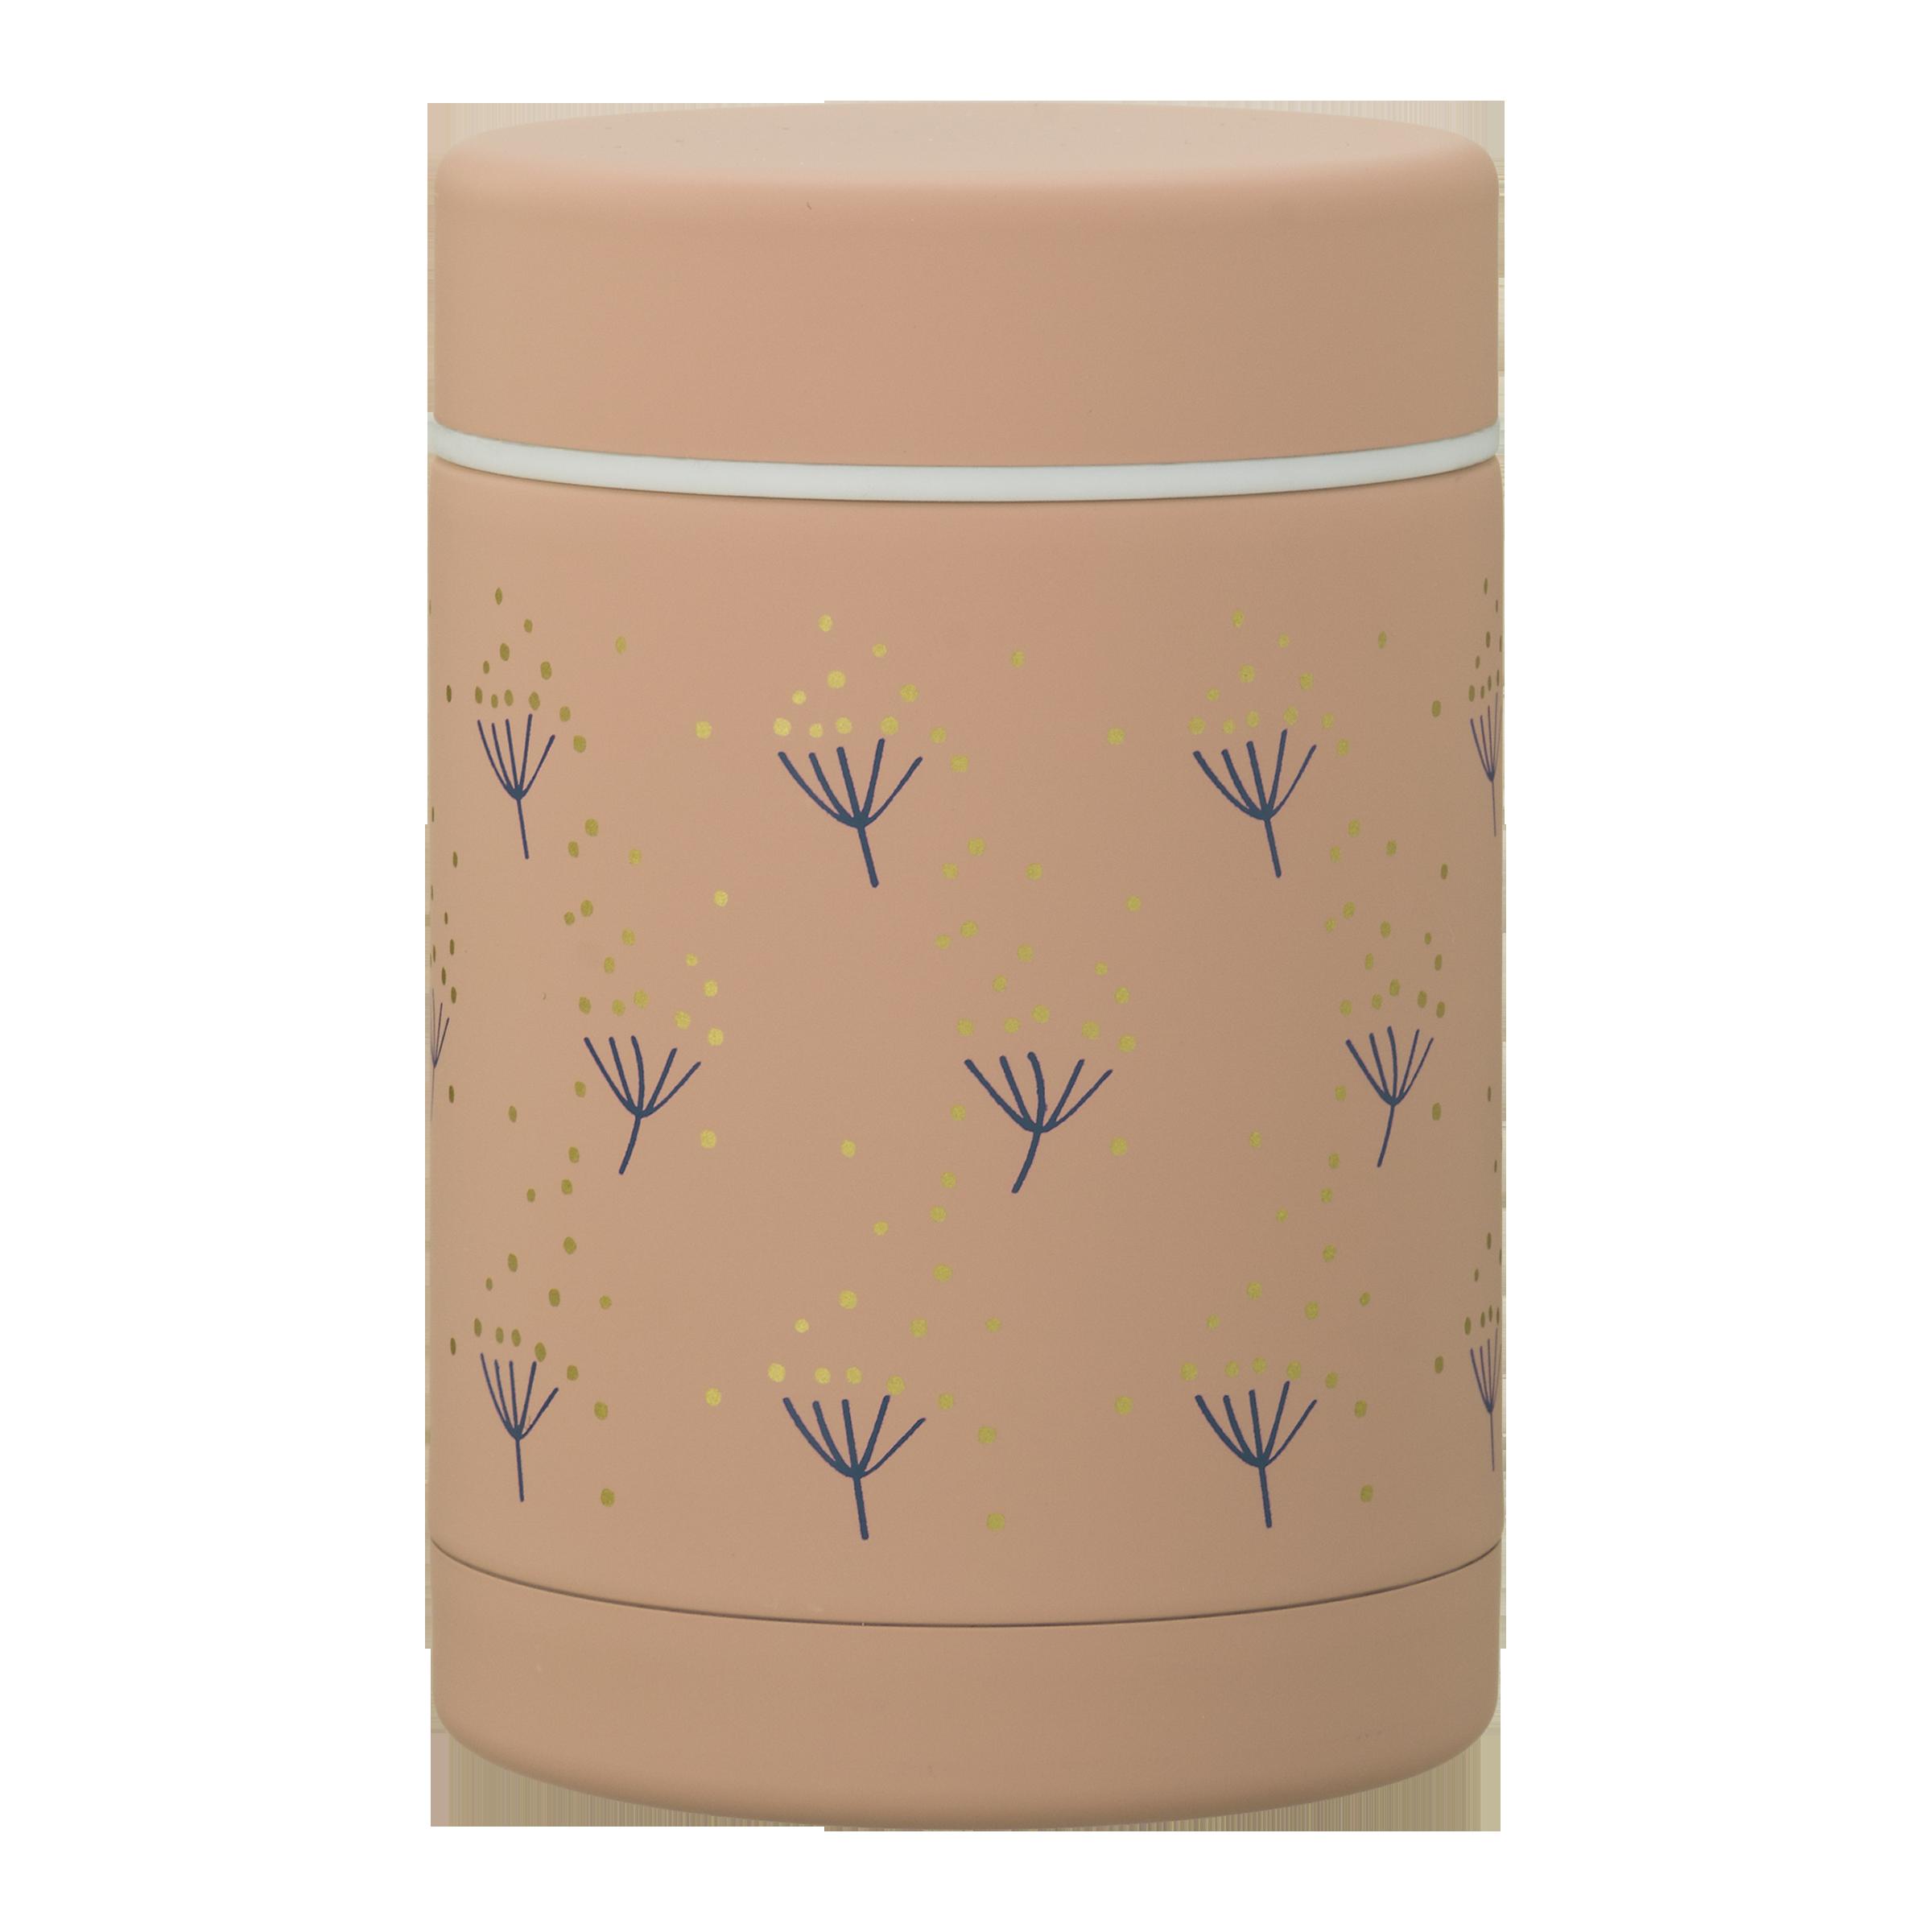 Afbeelding Fresk Thermische Foodbox I Dandelion